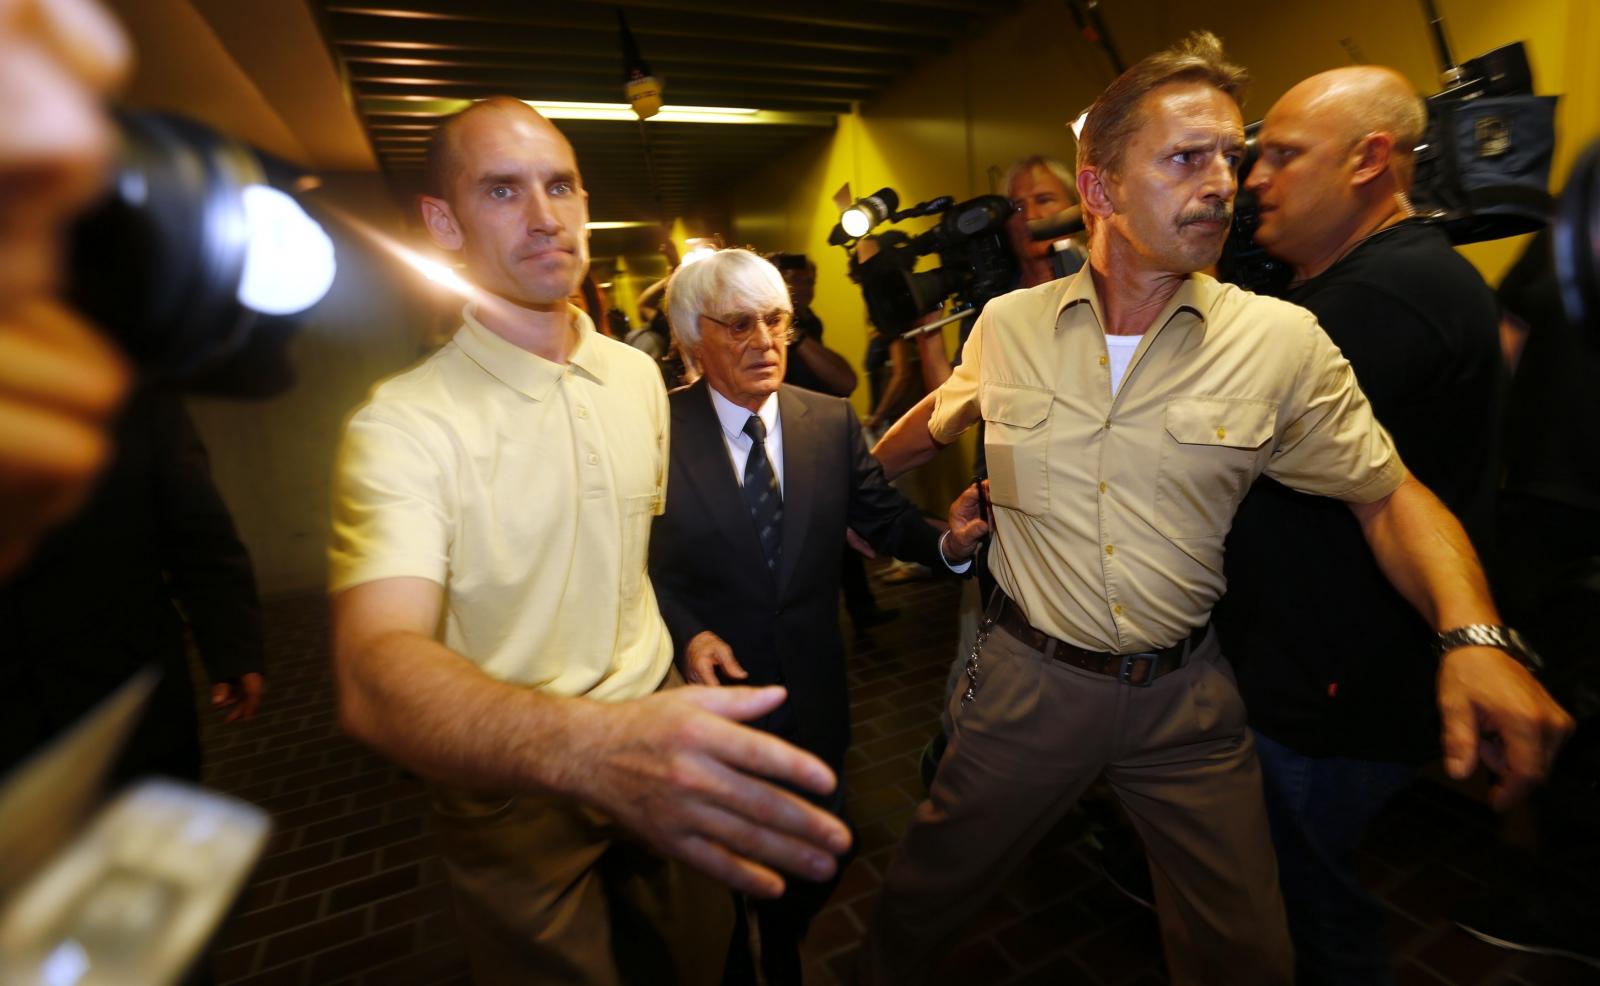 F1 Boss Bernie Ecclestone Pays $100m to End Bribery Trial